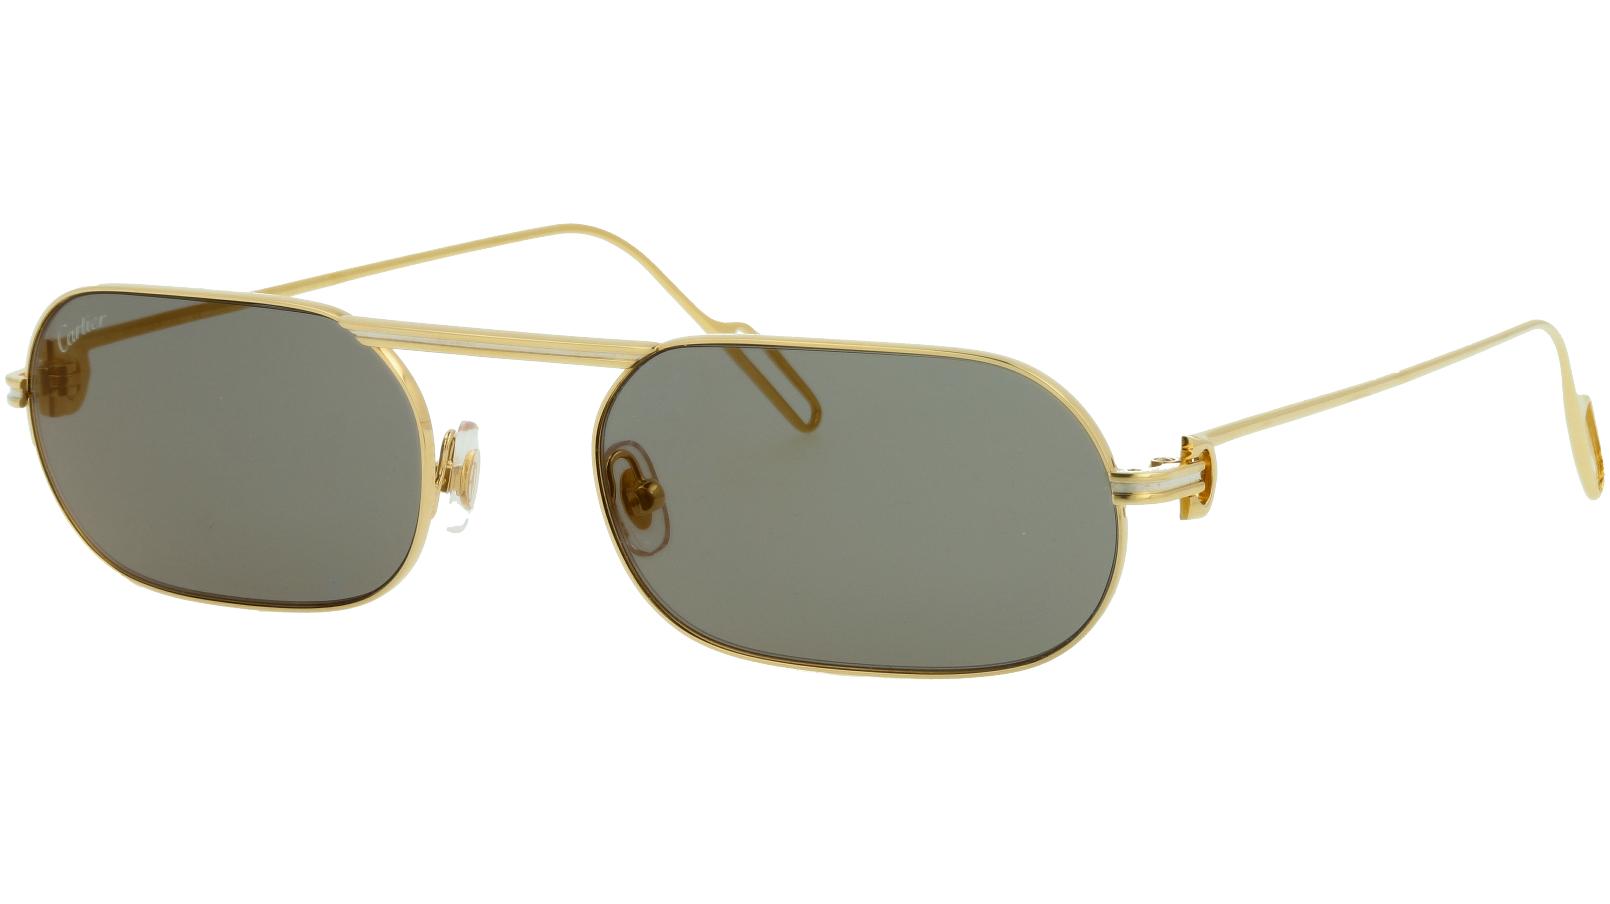 Cartier CT0112S 001 55 Gold Rectangle Sunglasses